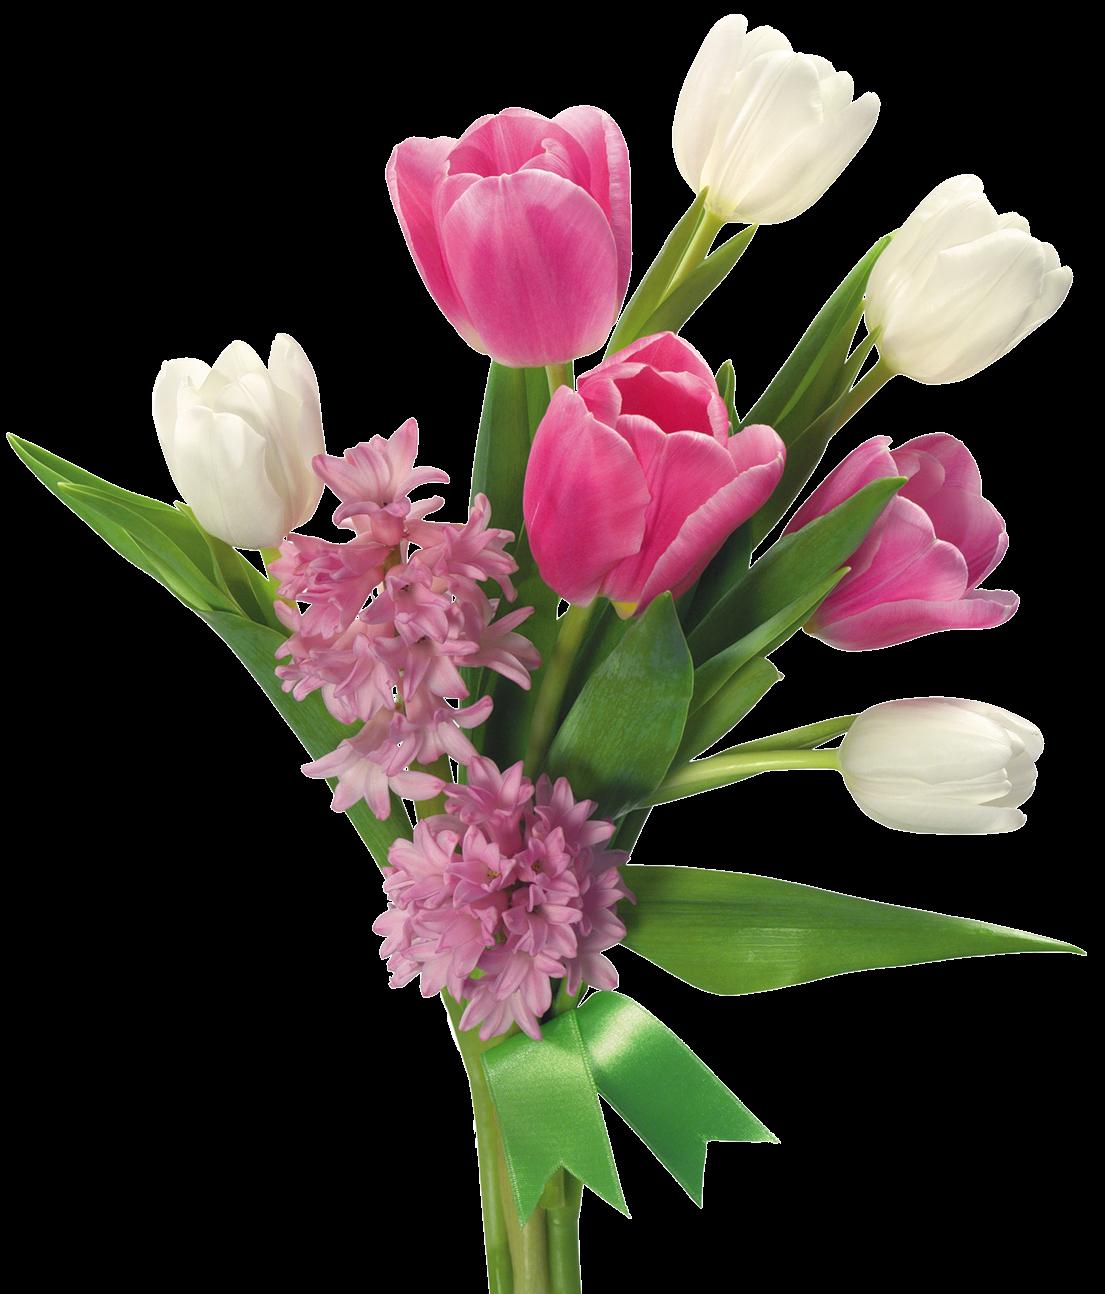 Flower HD PNG Transparent Flower HD.PNG Images. | PlusPNG